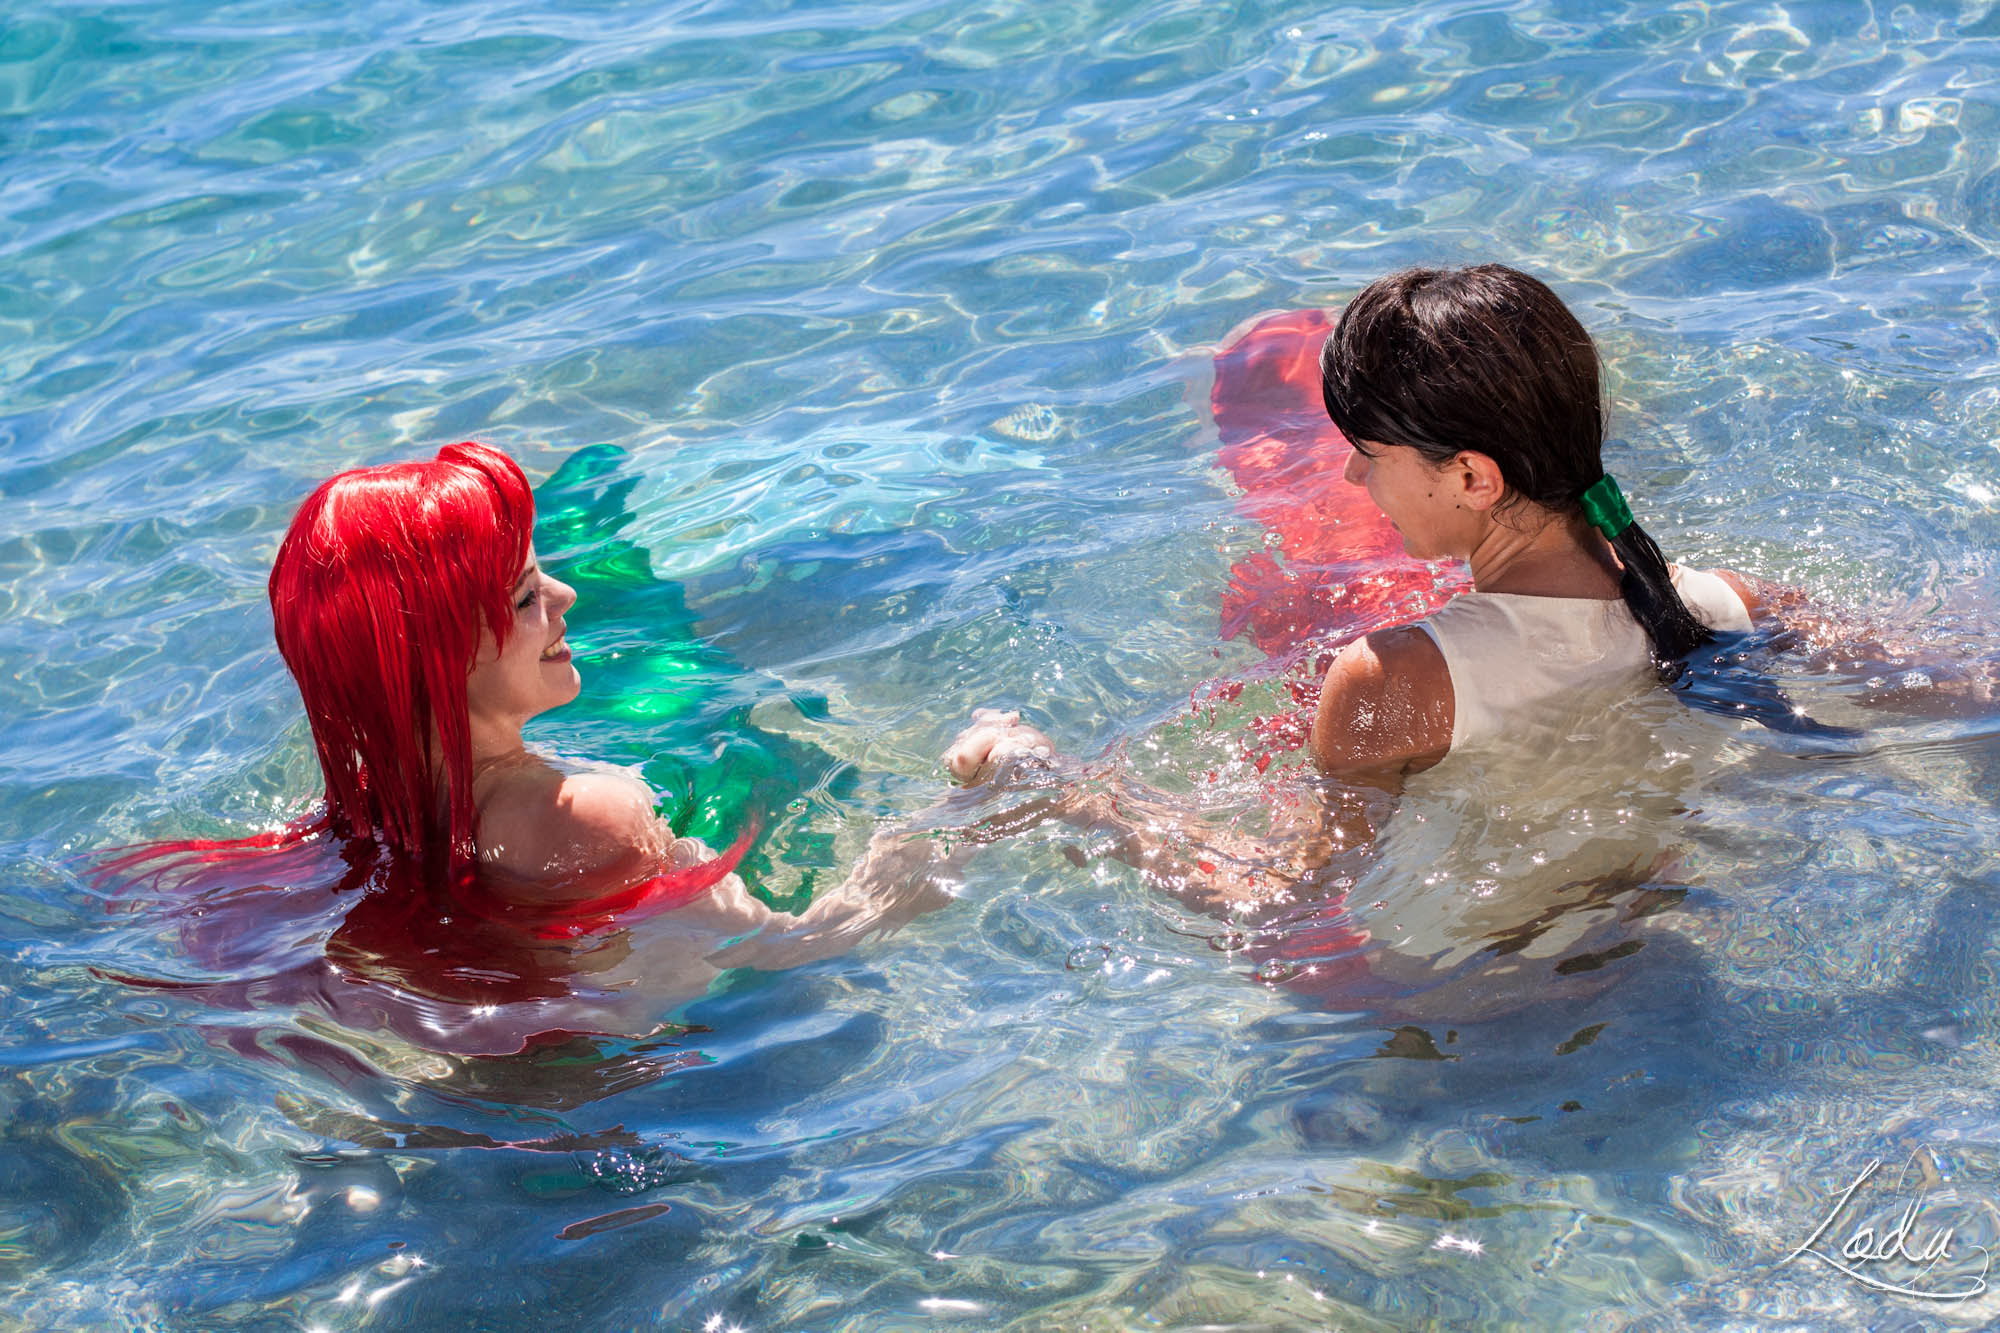 The Little Mermaid 2 by Erendrym